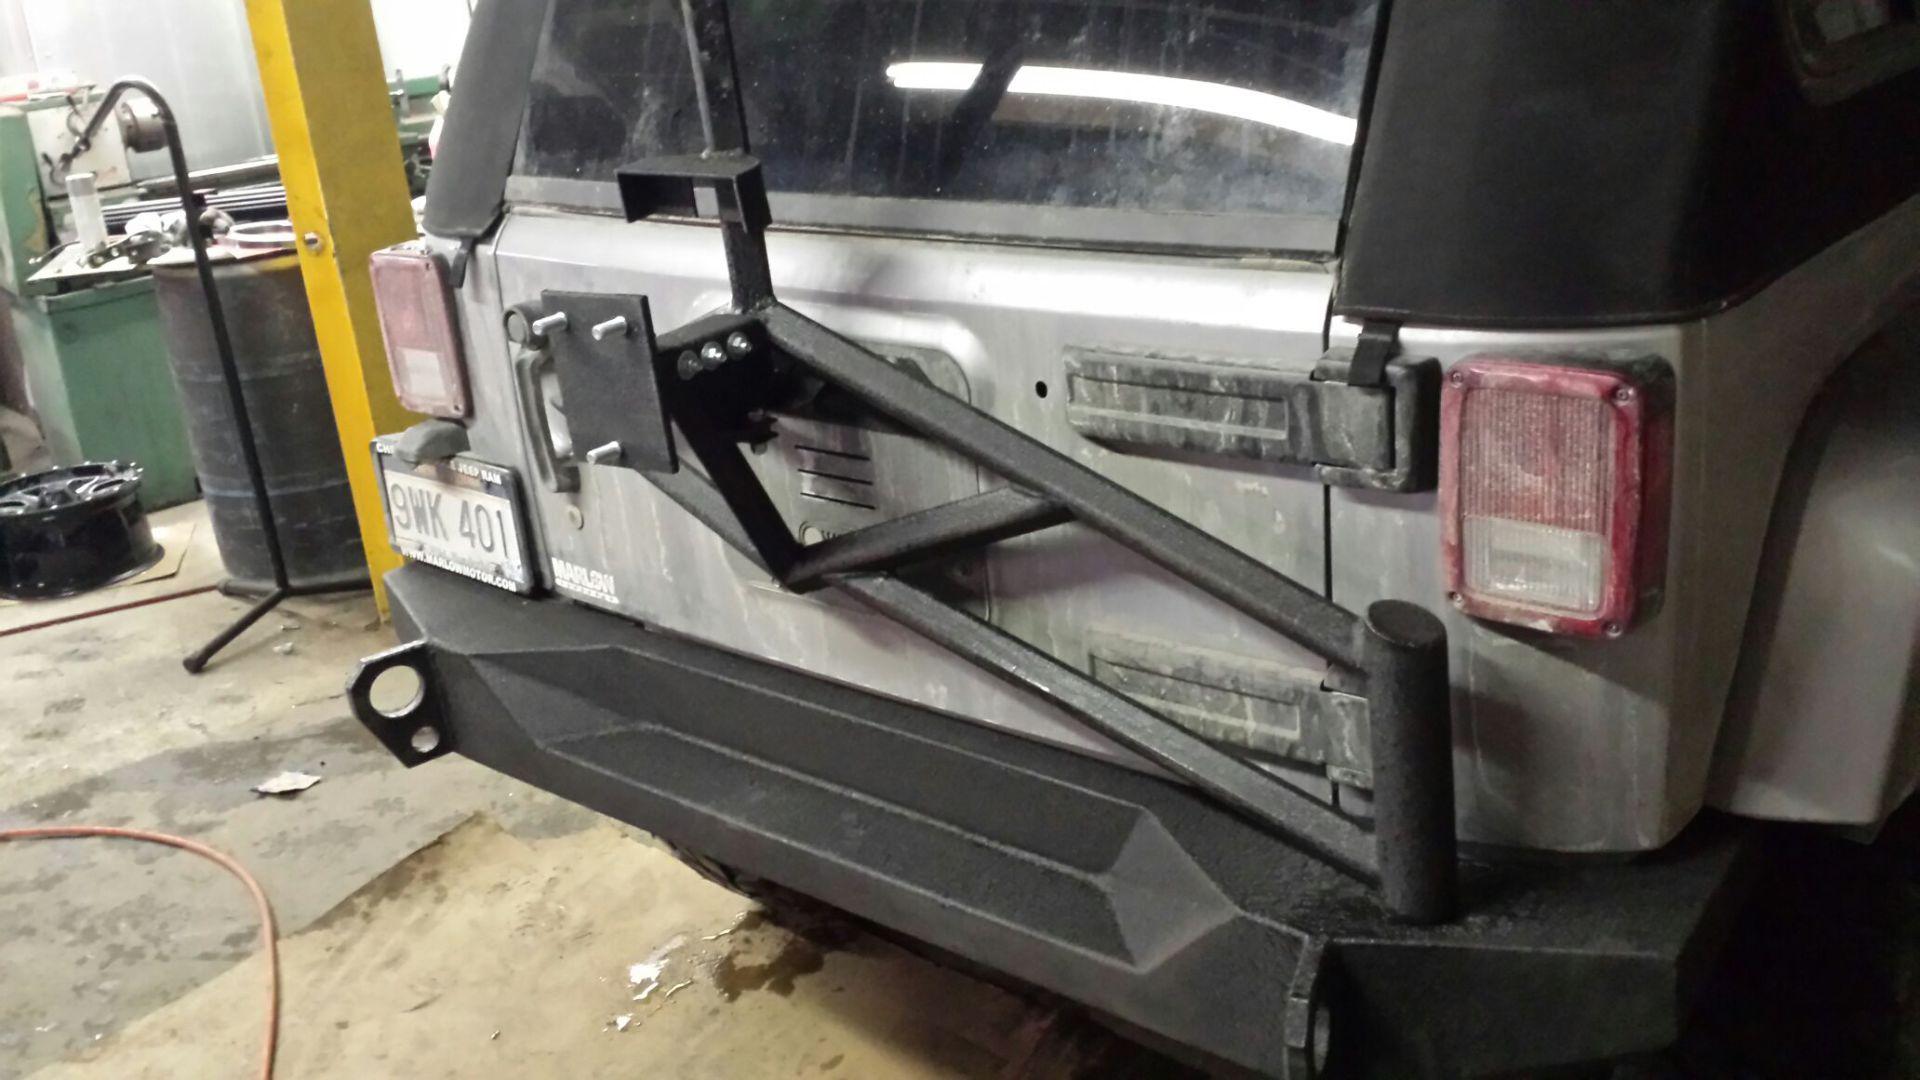 JK Rear Bumper with Tire Carrier